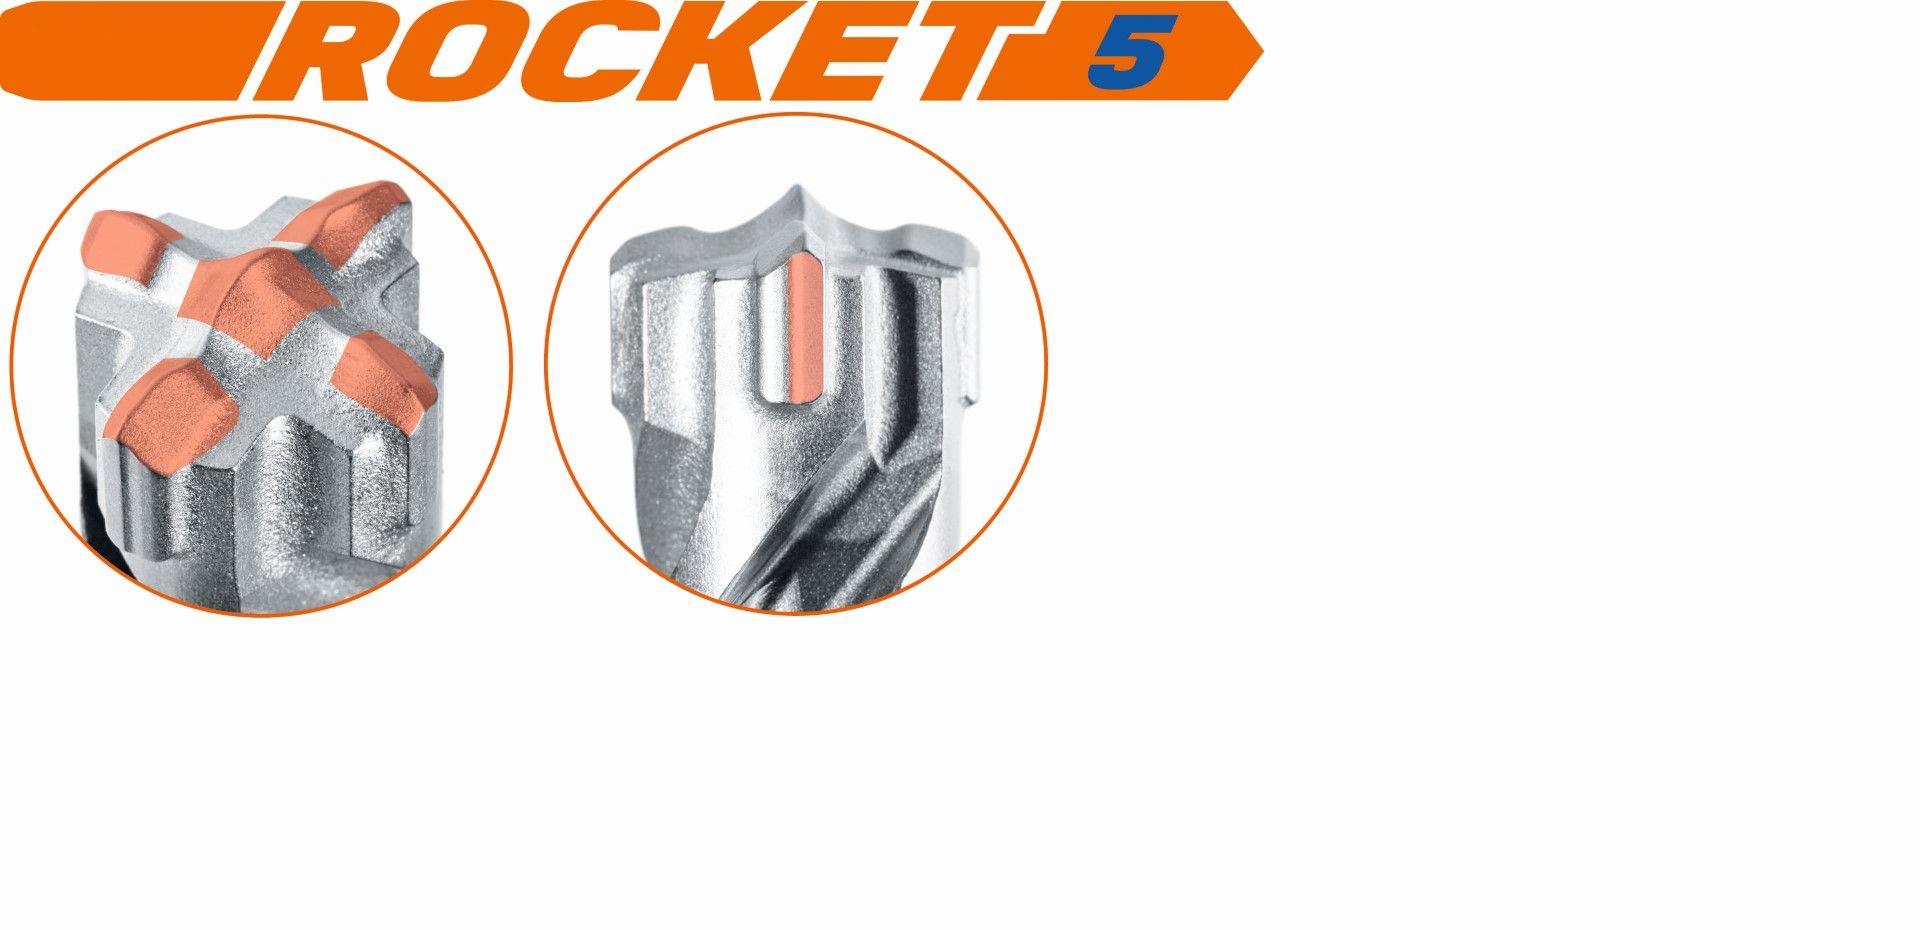 Slika BORER Rocket 5 SDS-plus 8x260mm 4-kraka